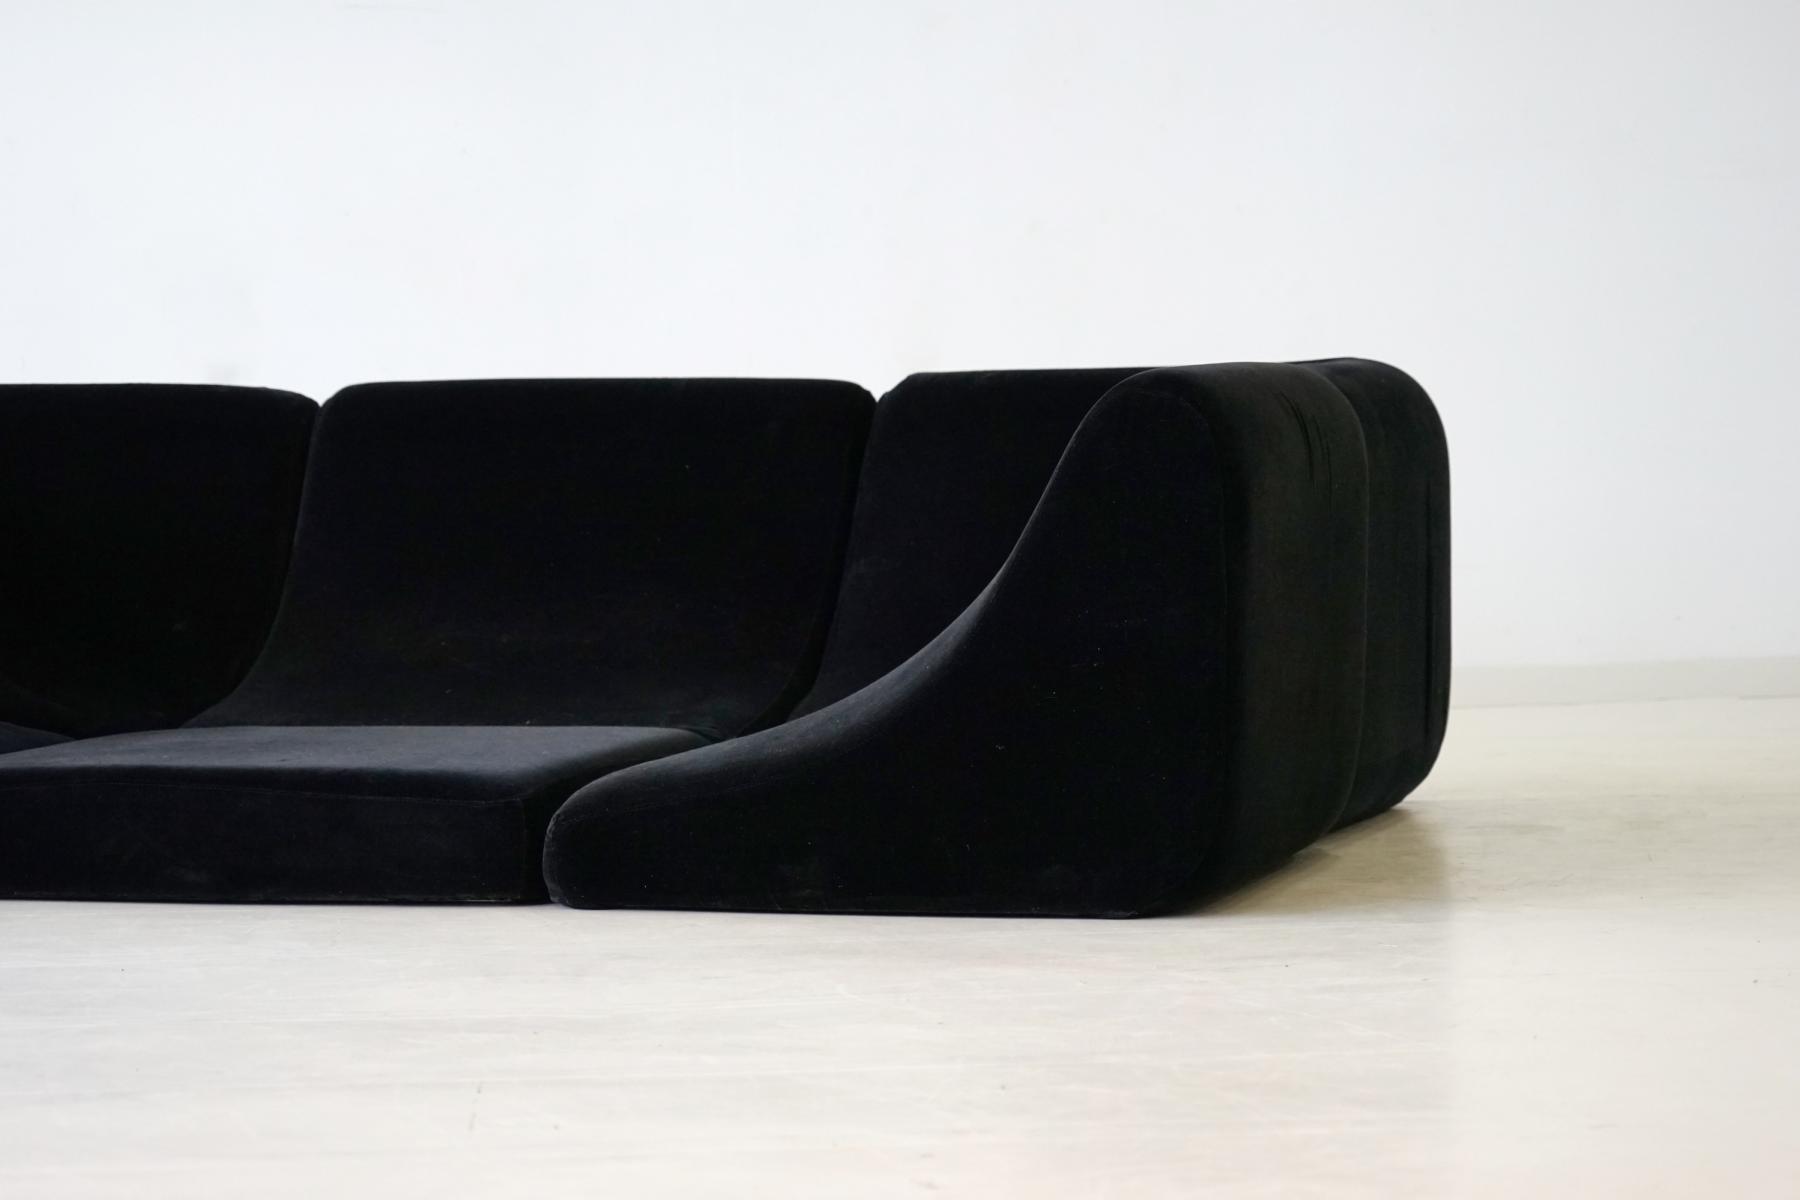 Side Sofa Side Sofa 46 With Jinanhongyu TheSofa : pool modular sofa side table by luigi colani for rosenthal 1970s 3 from thesofa.droogkast.com size 1800 x 1200 jpeg 59kB